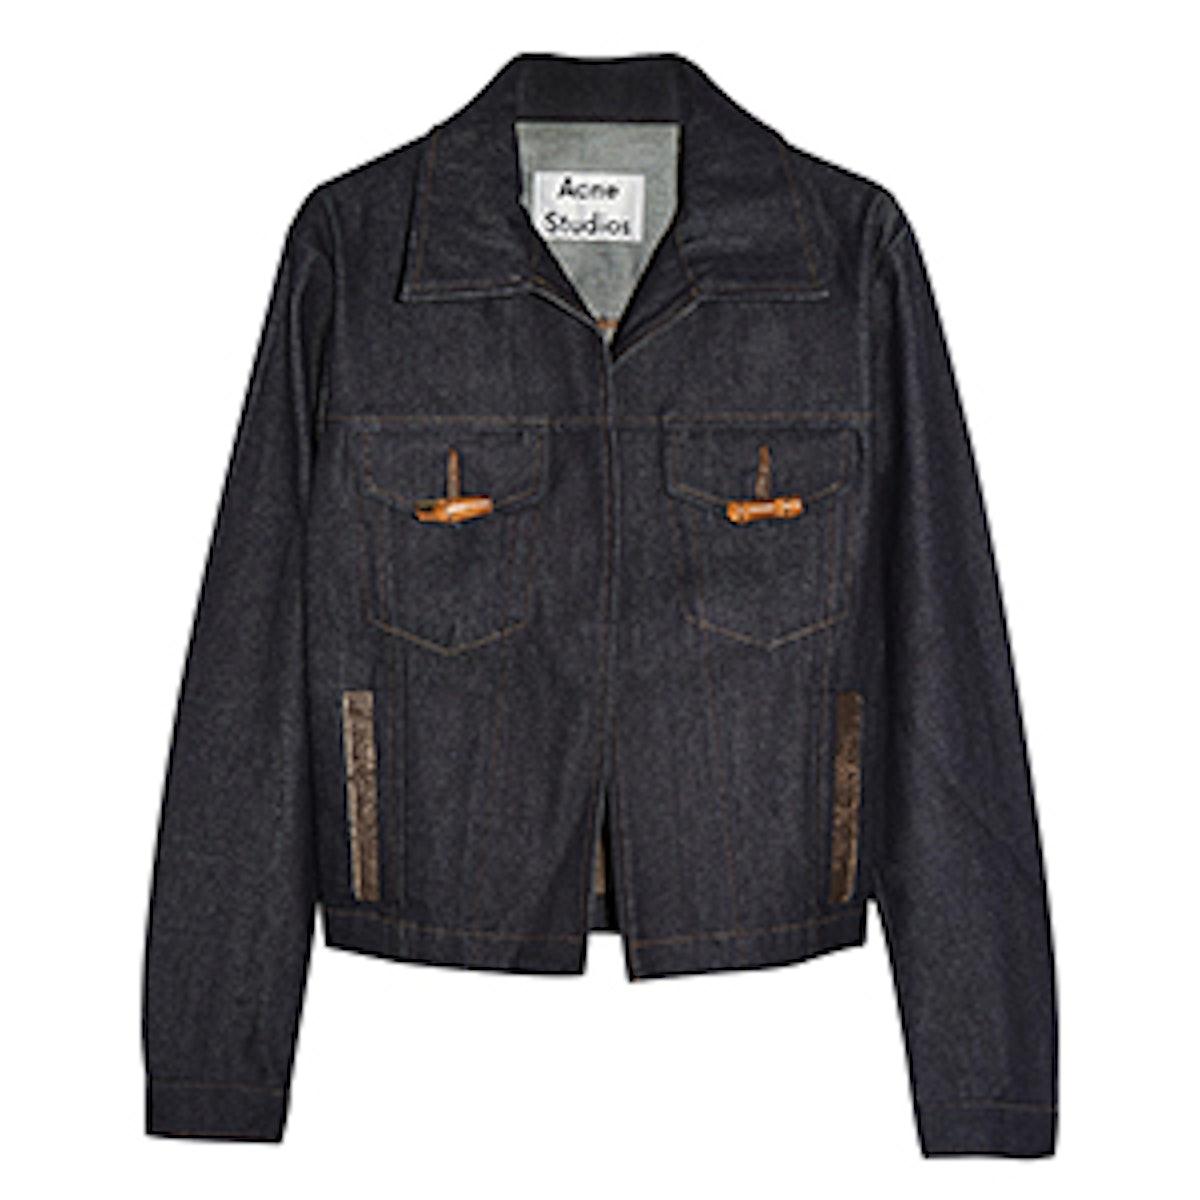 North Raw leather-trimmed denim jacket